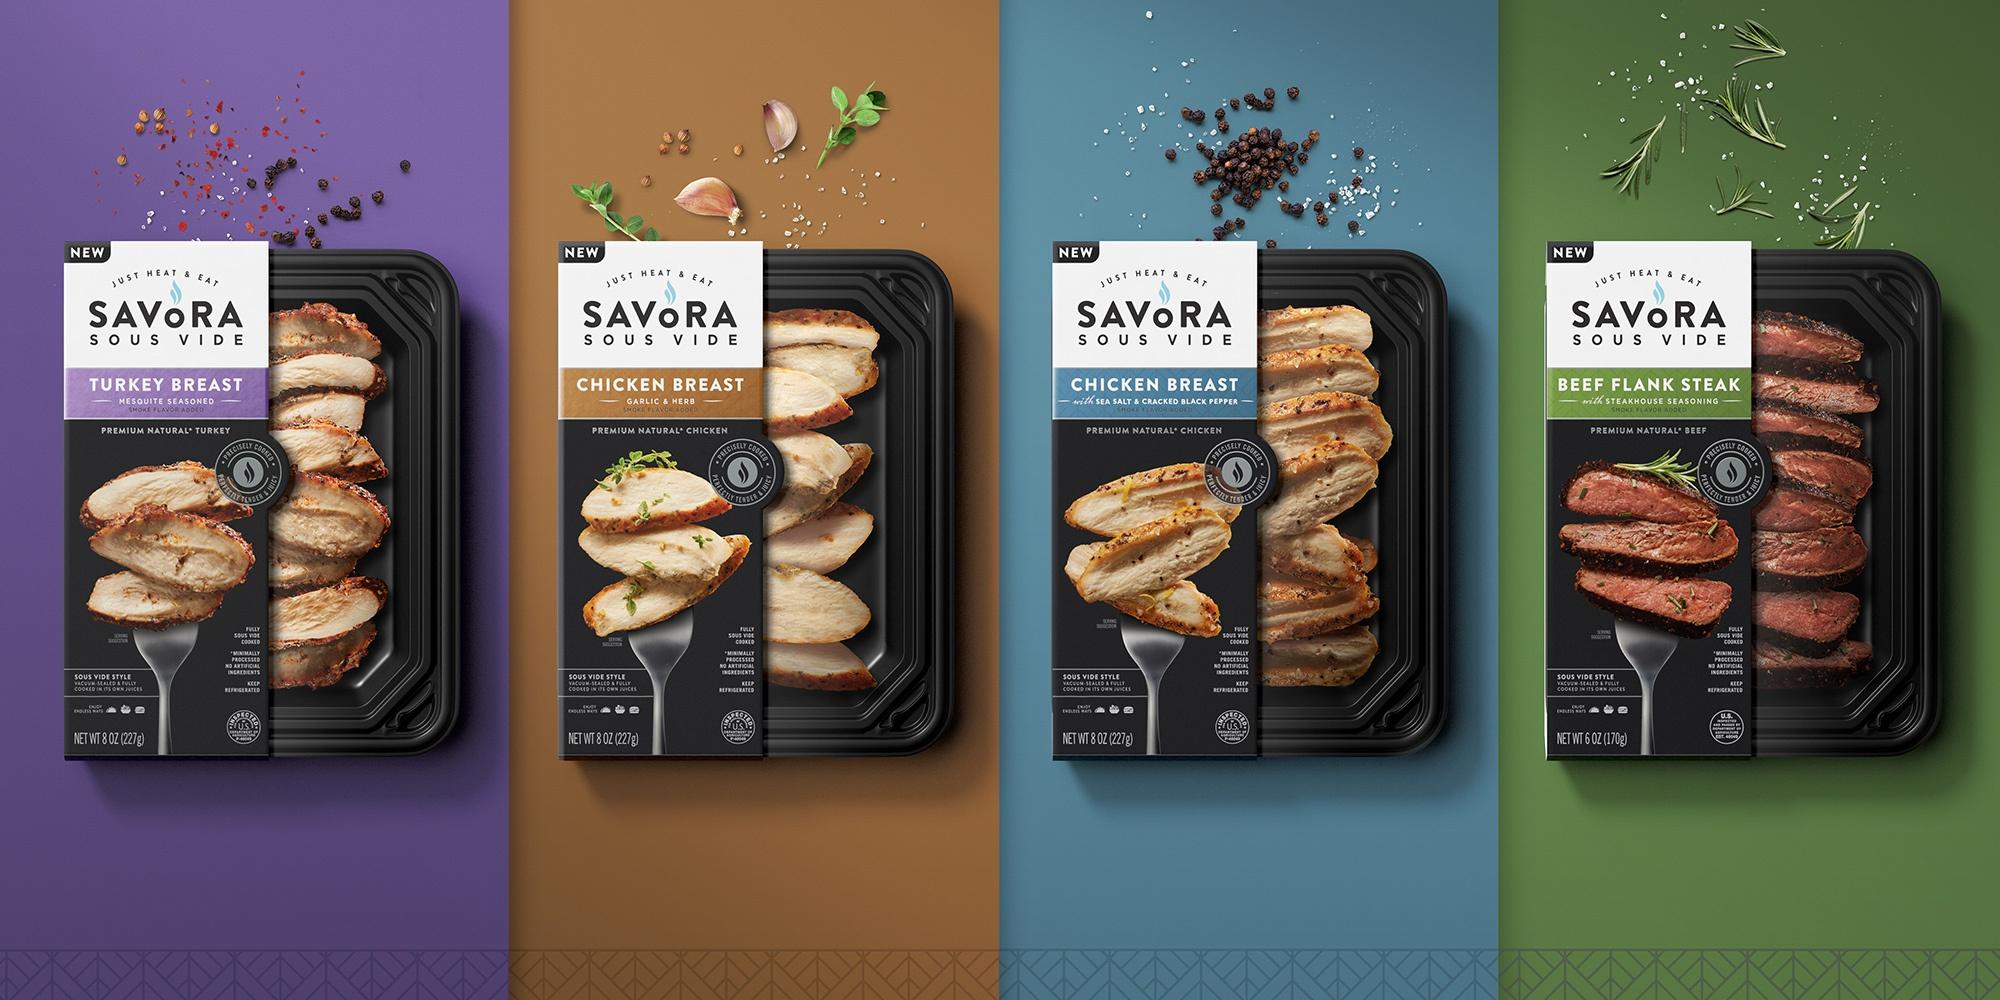 Savora-Carousel-3-2000x1000